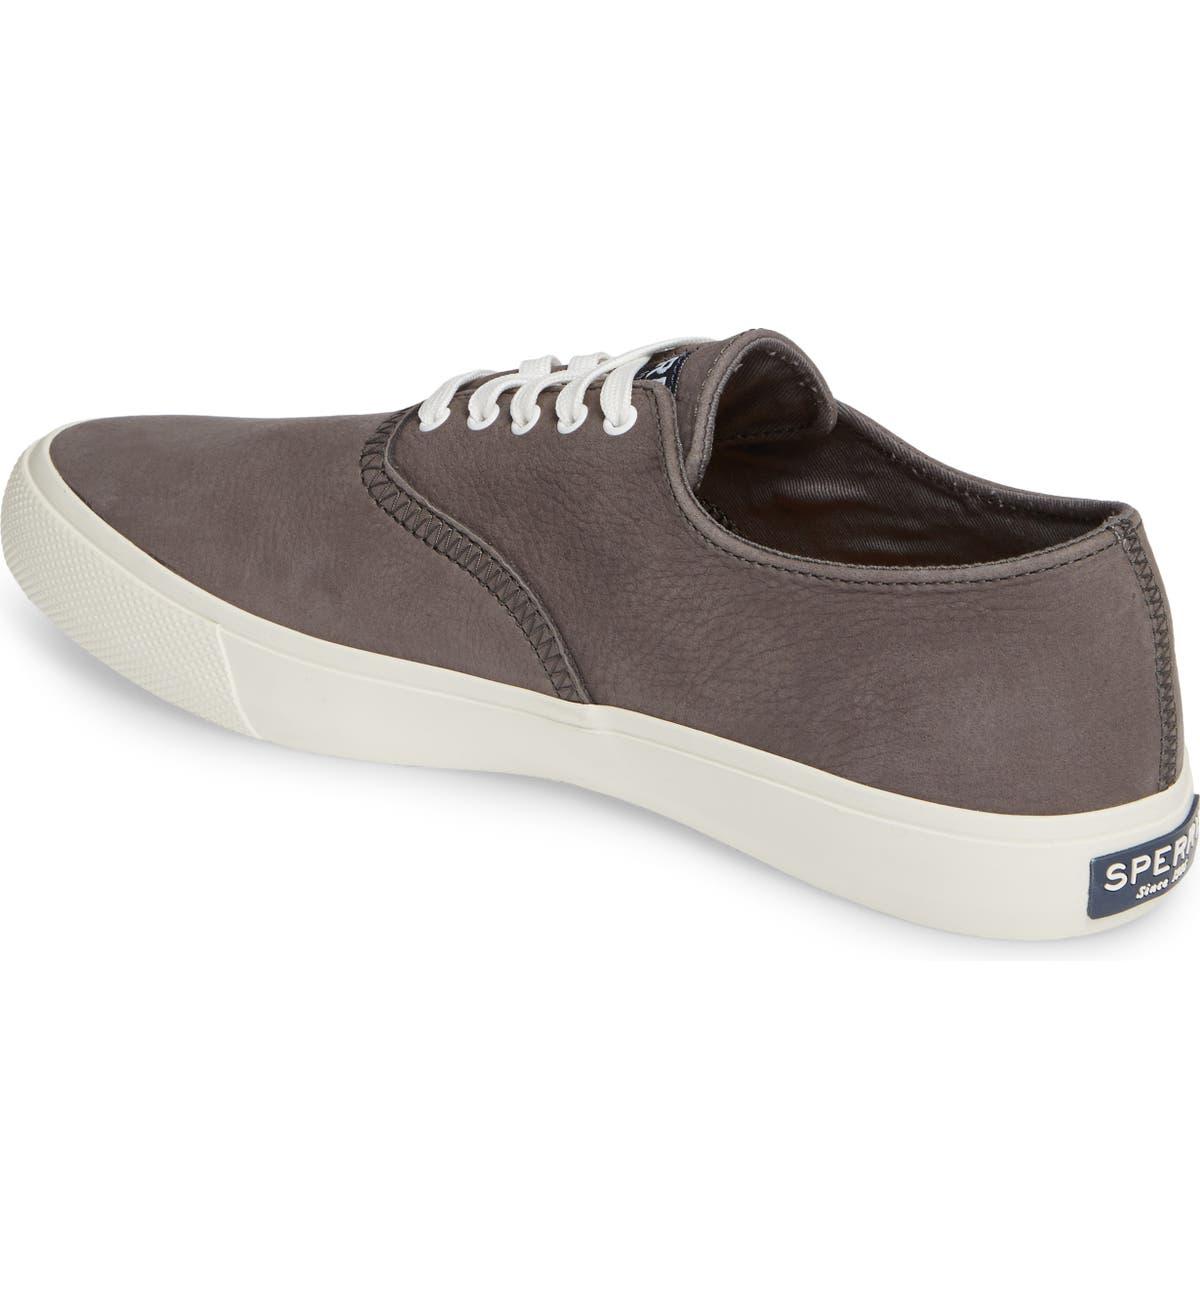 318de92d3215f Sperry Captains CVO Washable Sneaker (Men)   Nordstrom